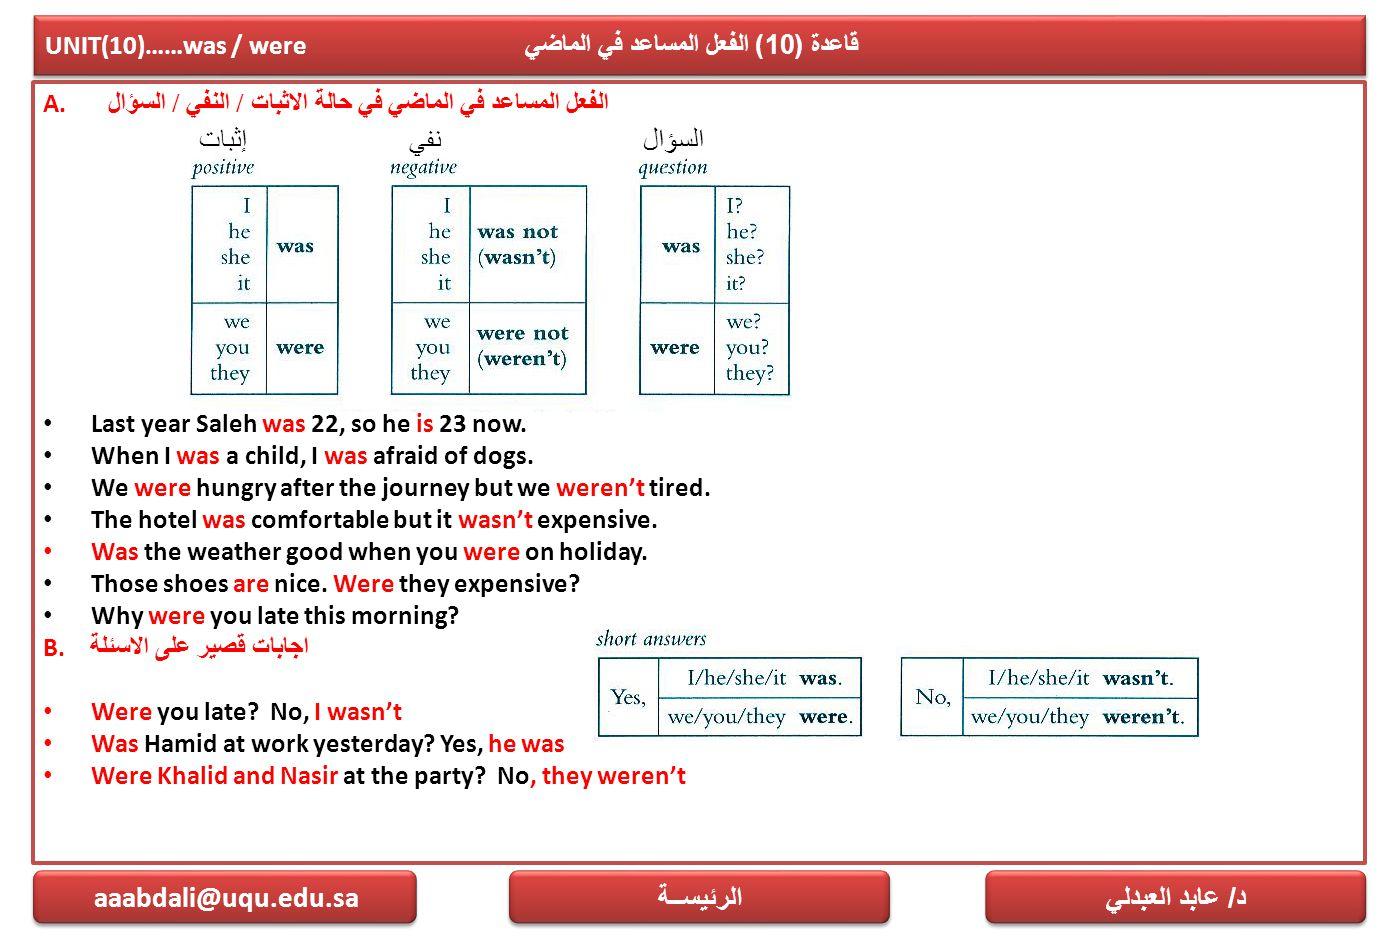 UNIT(10)……was / were قاعدة (10) الفعل المساعد في الماضي A. الفعل المساعد في الماضي في حالة الاثبات / النفي / السؤال Last year Saleh was 22, so he is 2